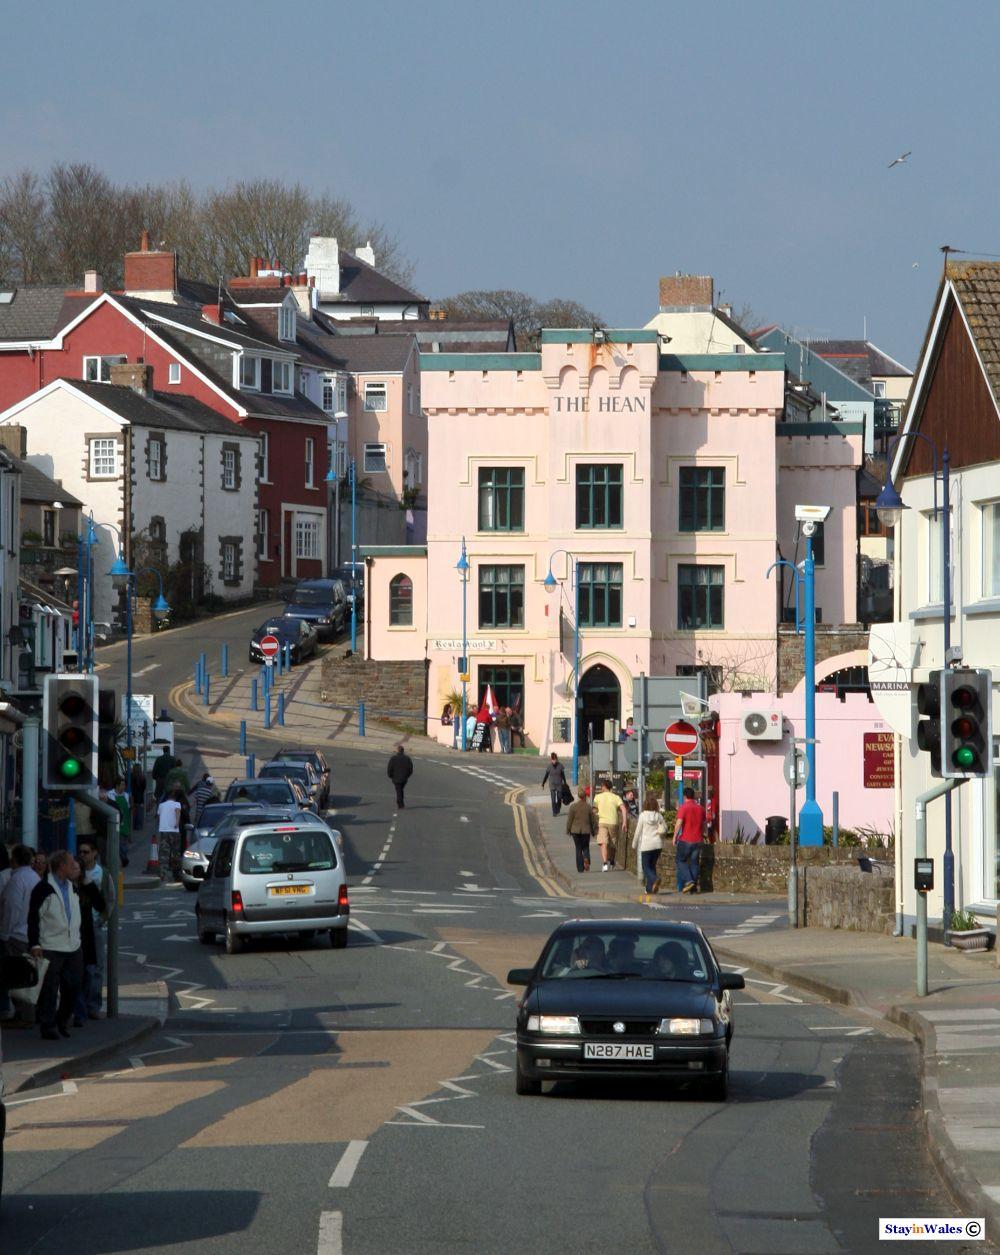 Saundersfoot town centre